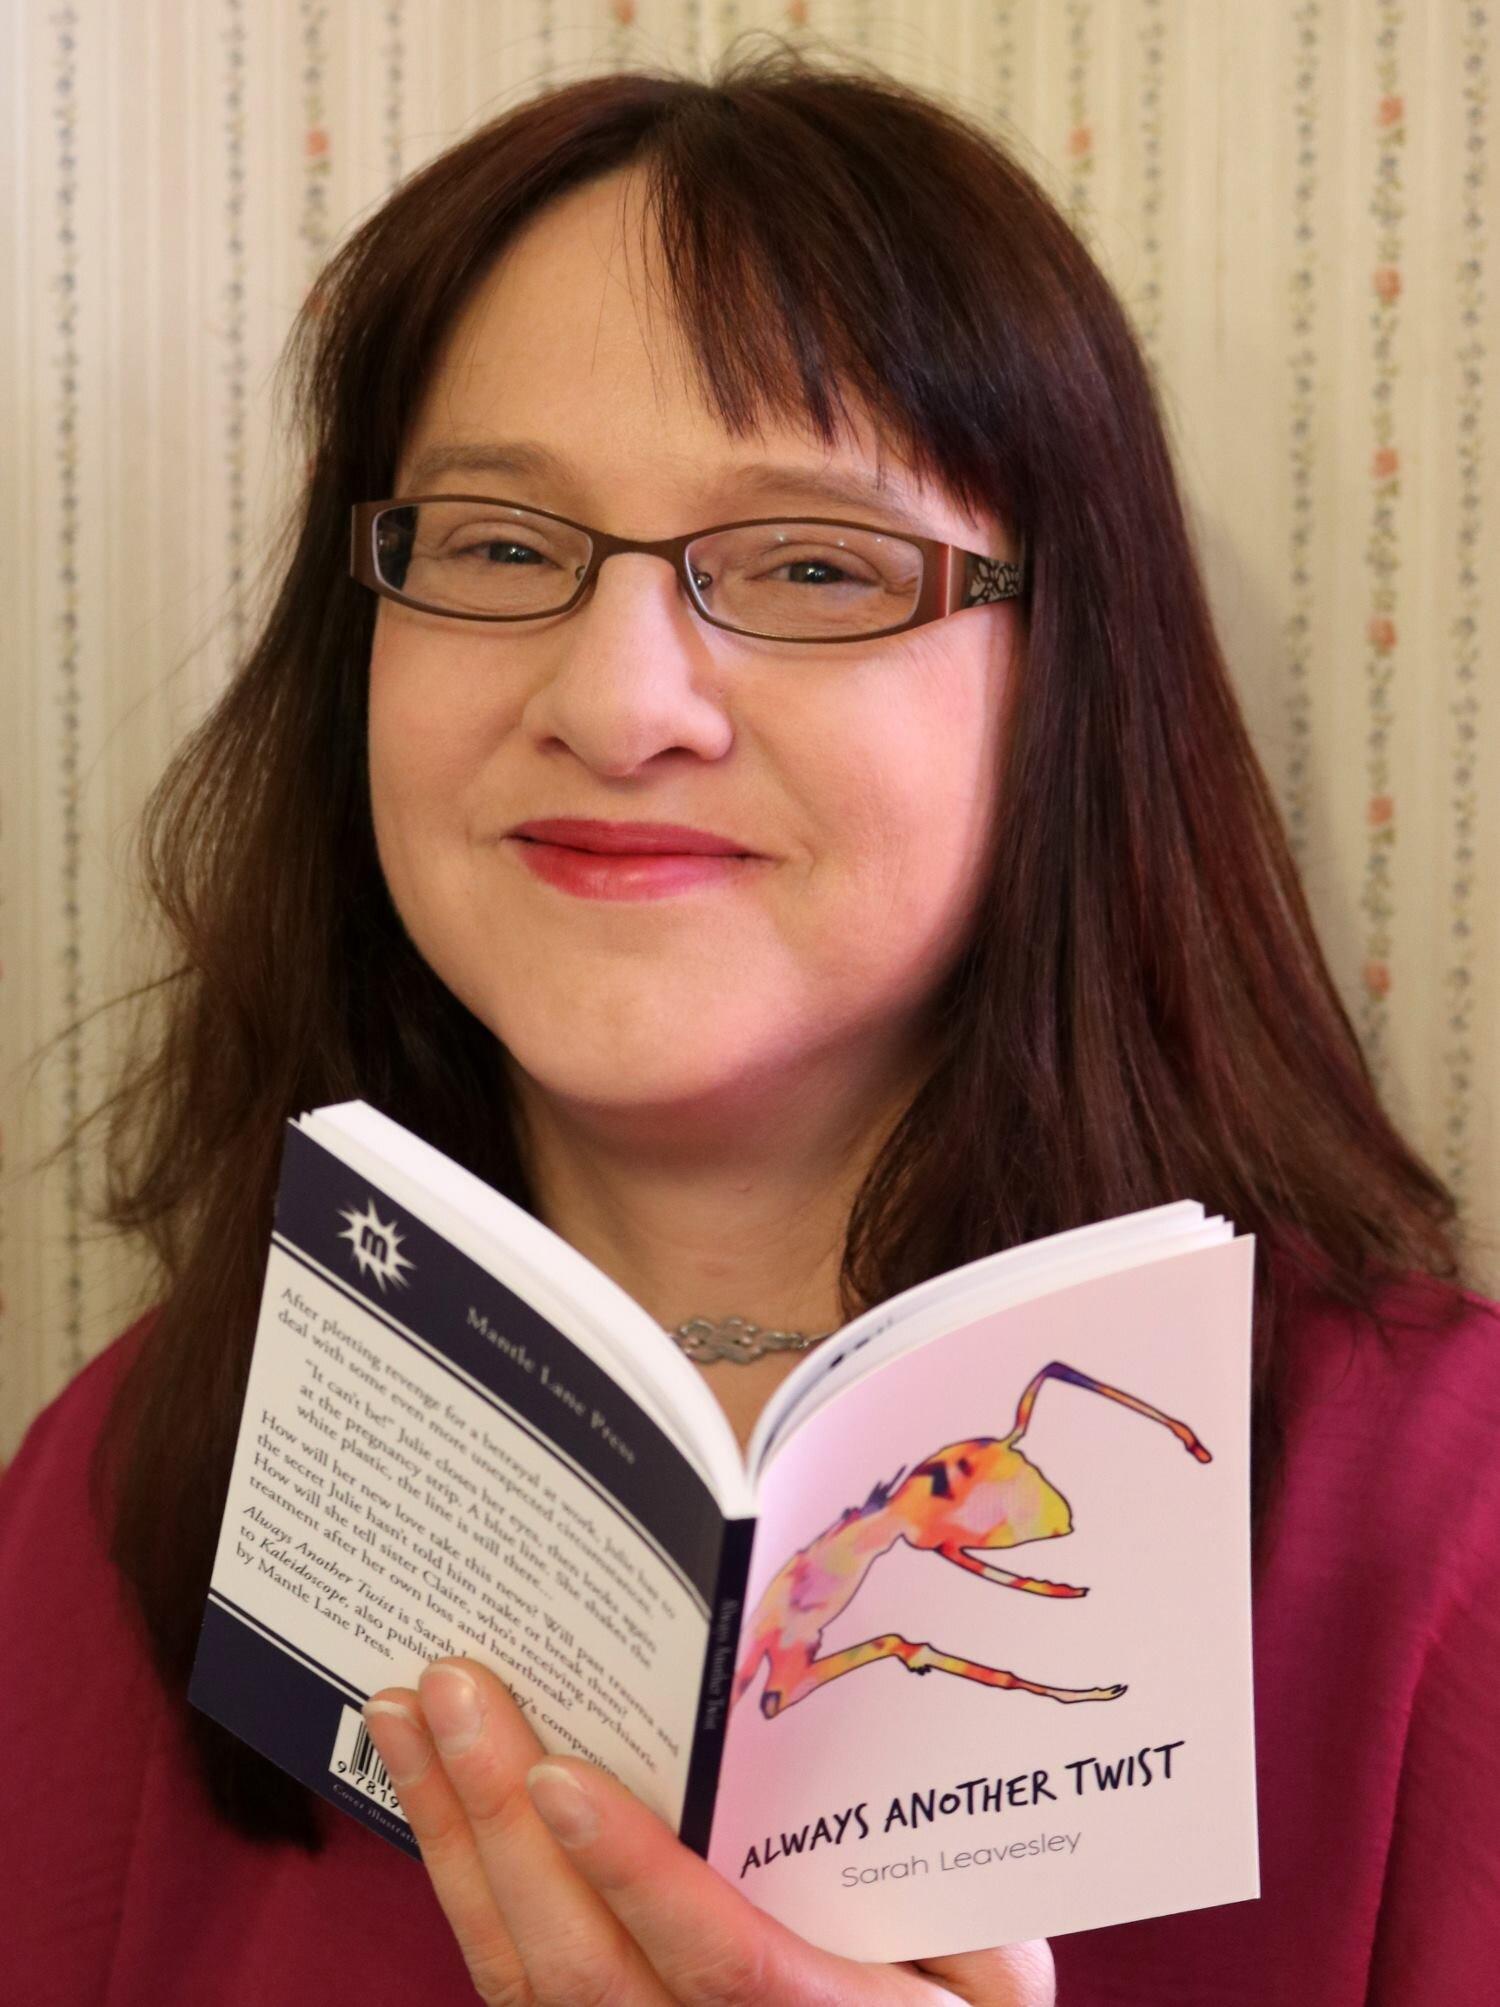 Sarah Leavesley